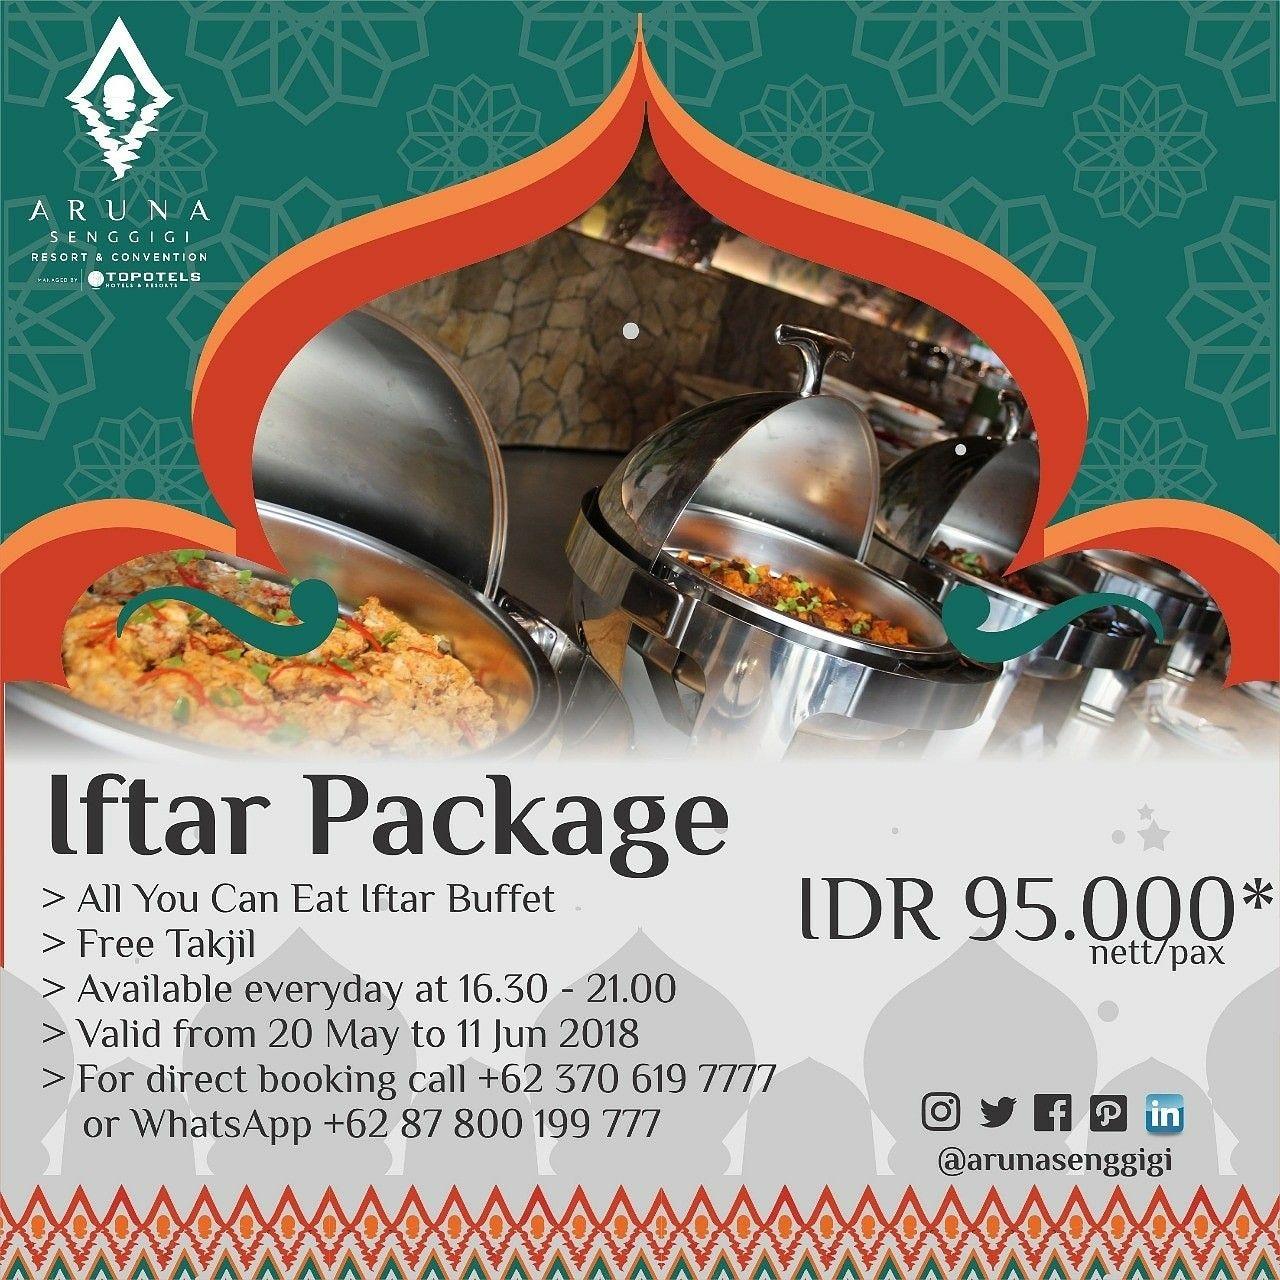 Go Get It Aruna Iftar Package Only Idr 95 000nett Pax